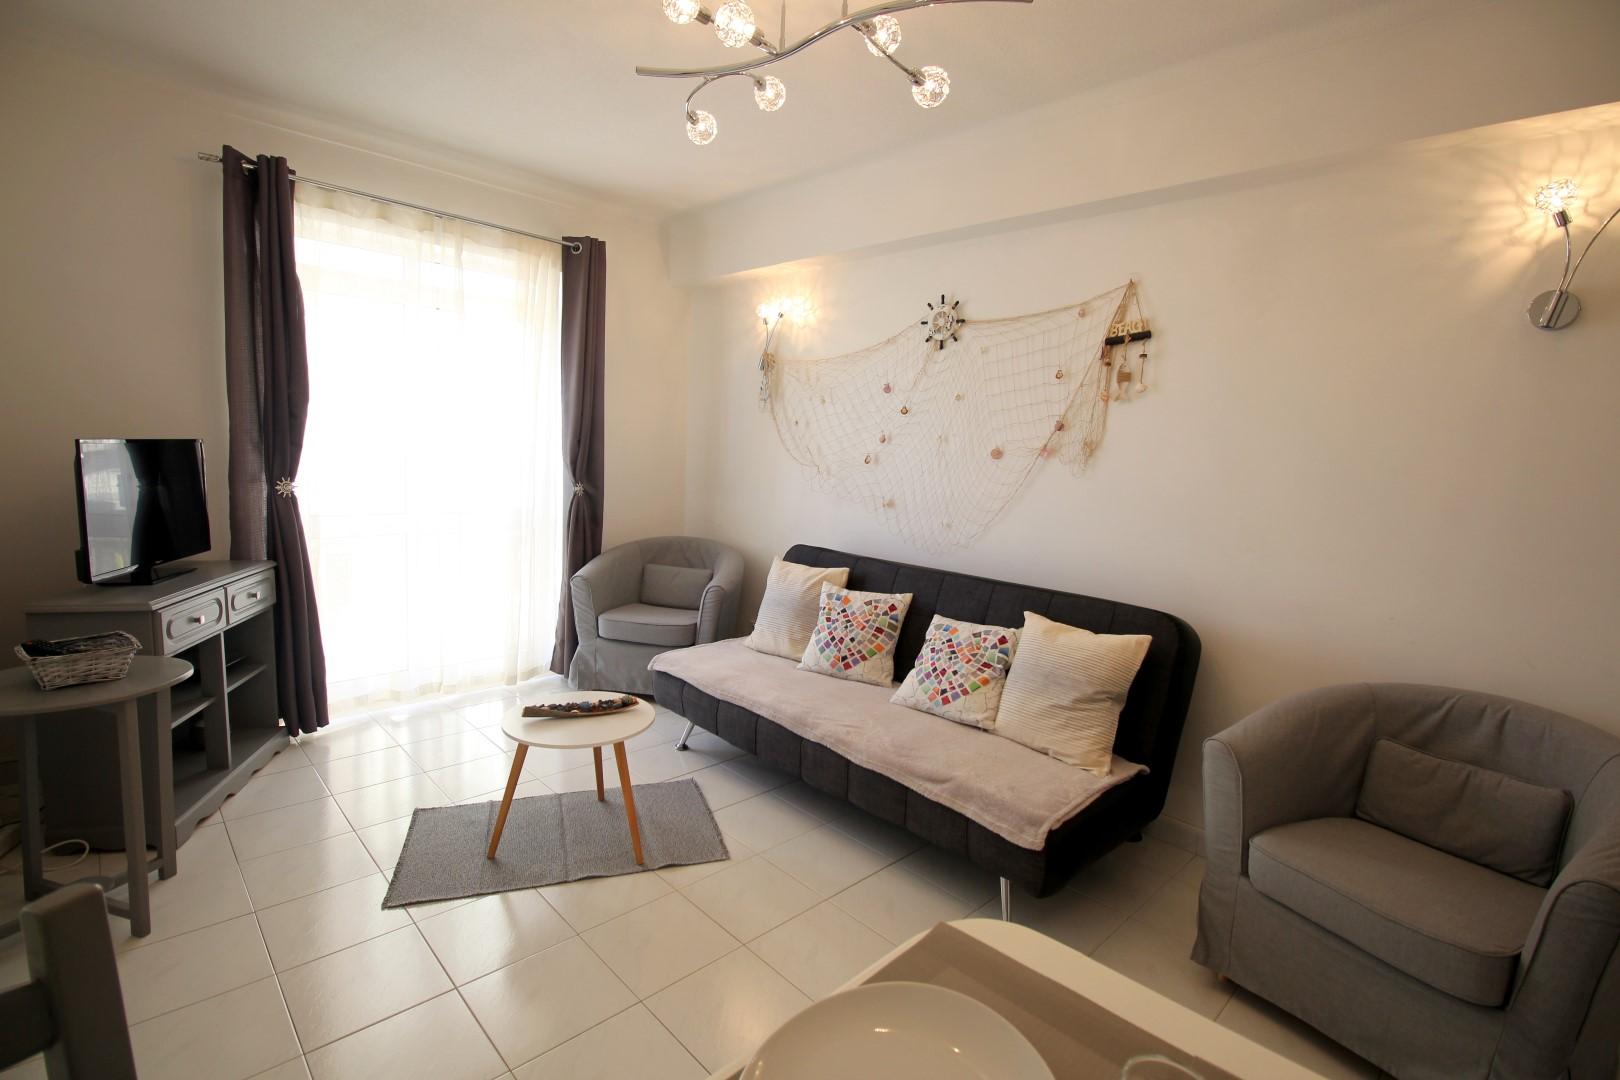 Location appartements et villas de vacance, Appartement en face de la plage – Armação-de-Pêra à Armação de Pêra, Portugal Algarve, REF_IMG_6809_8739